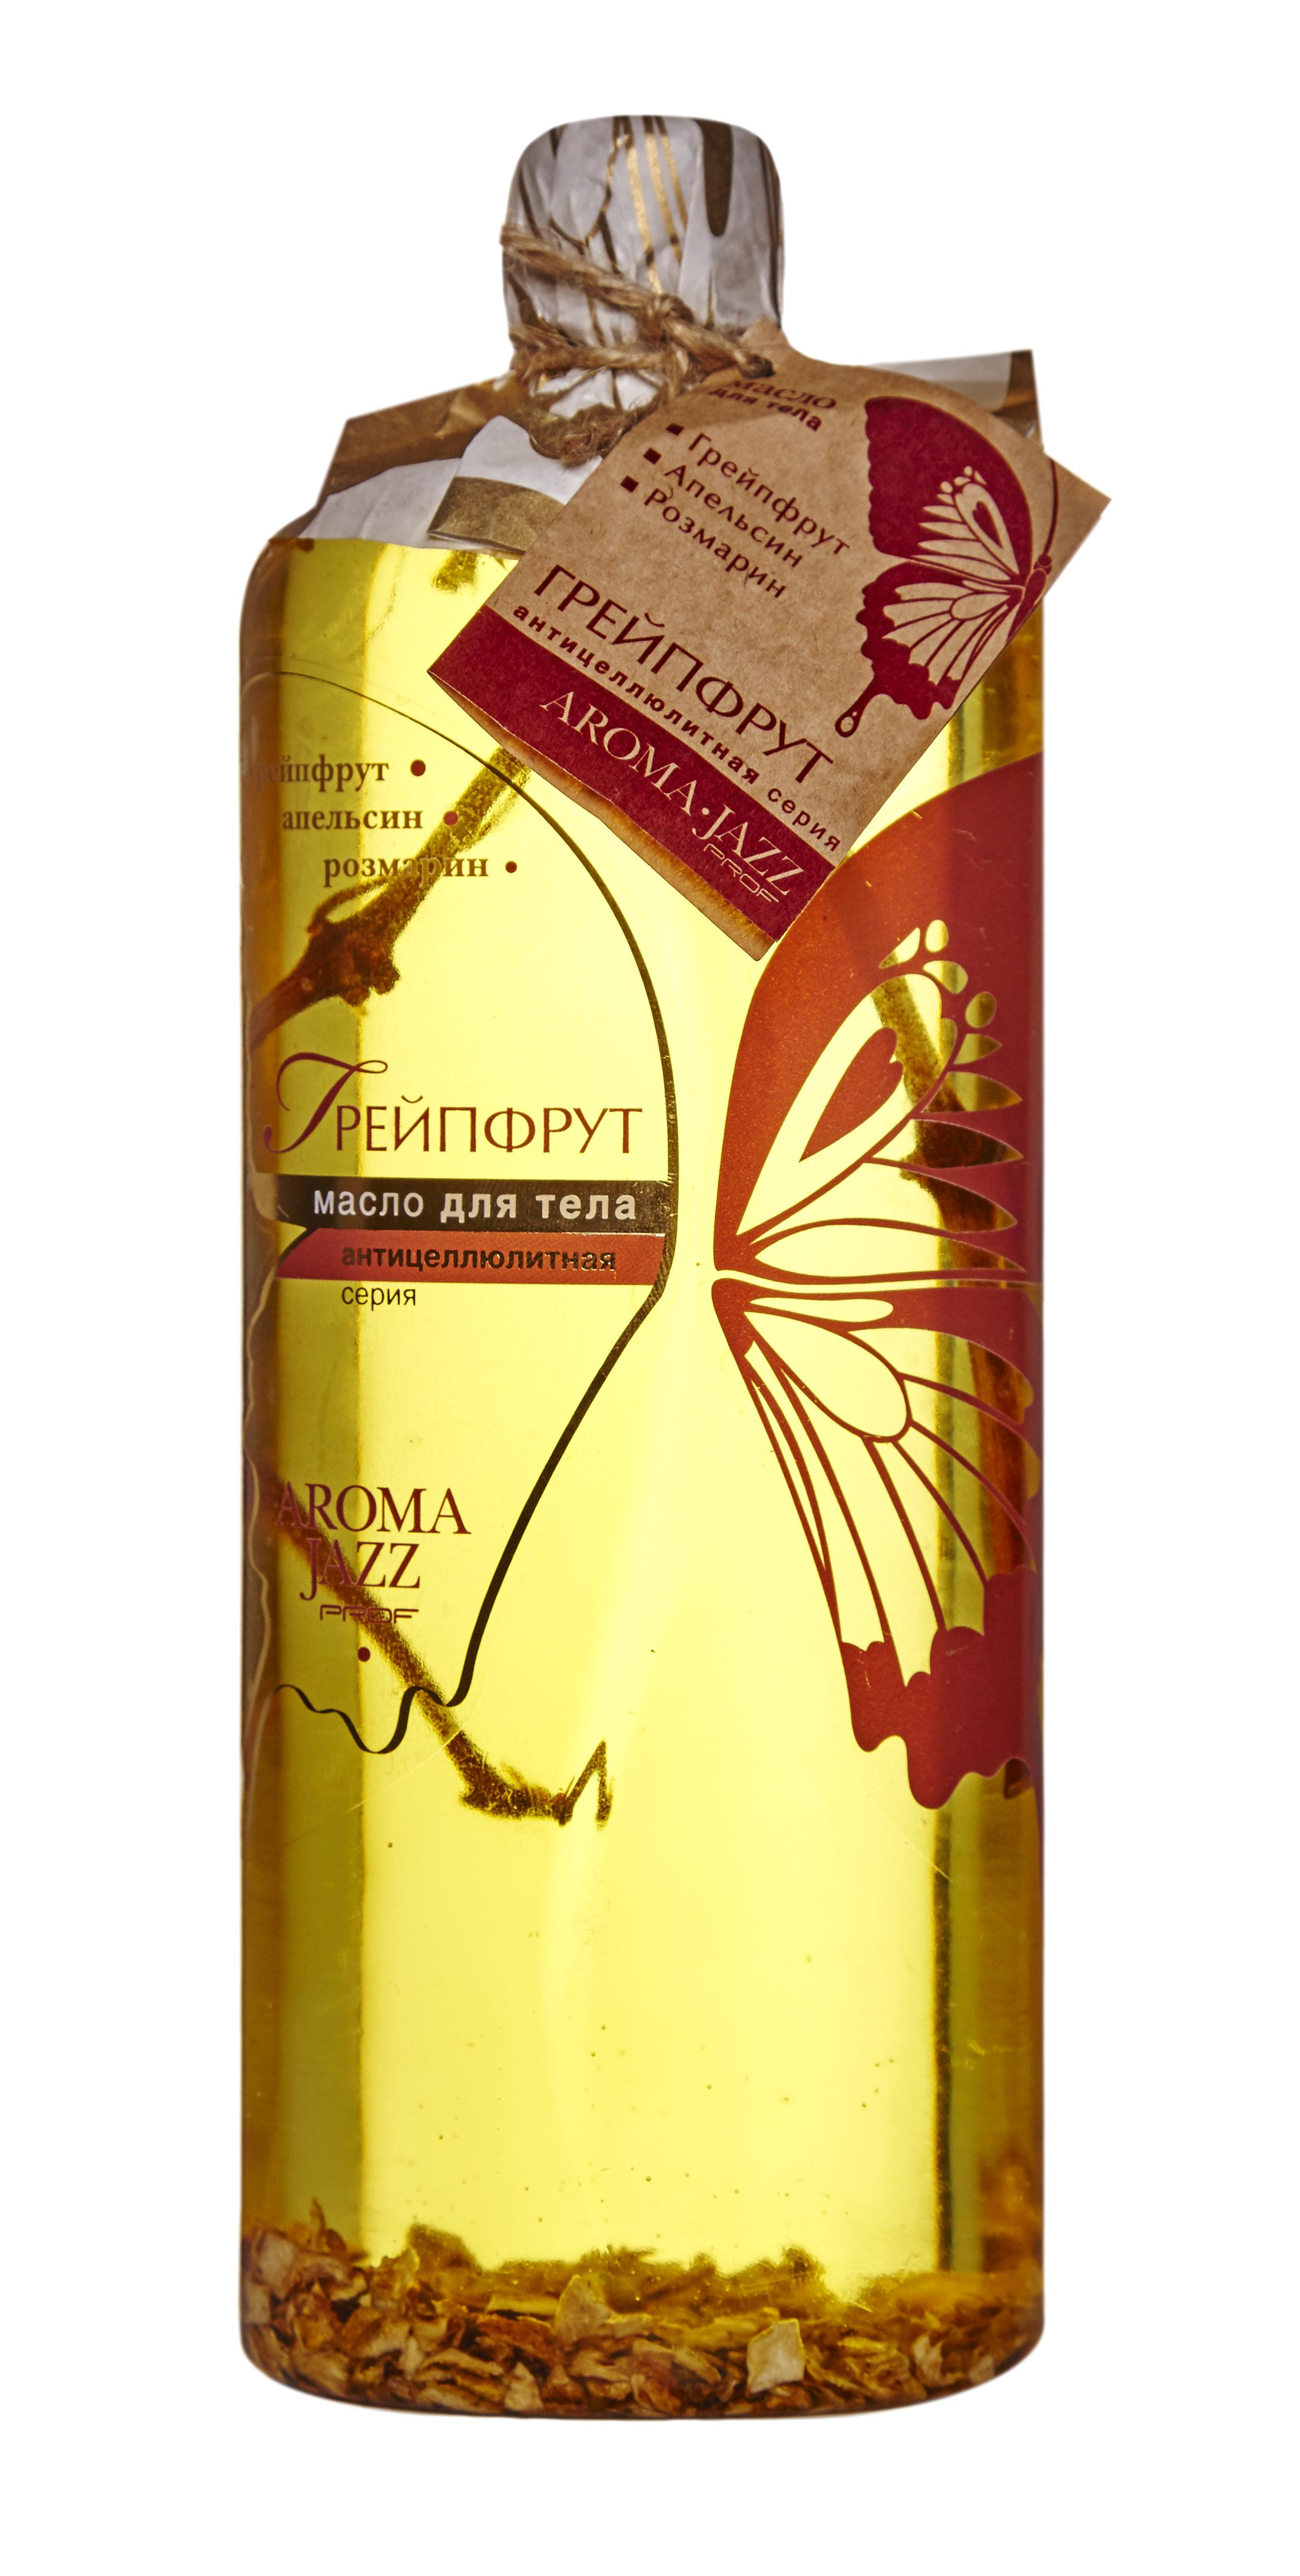 "AROMA JAZZ Масло массажное жидкое для тела ""Грейпфрут"" 1000мл"